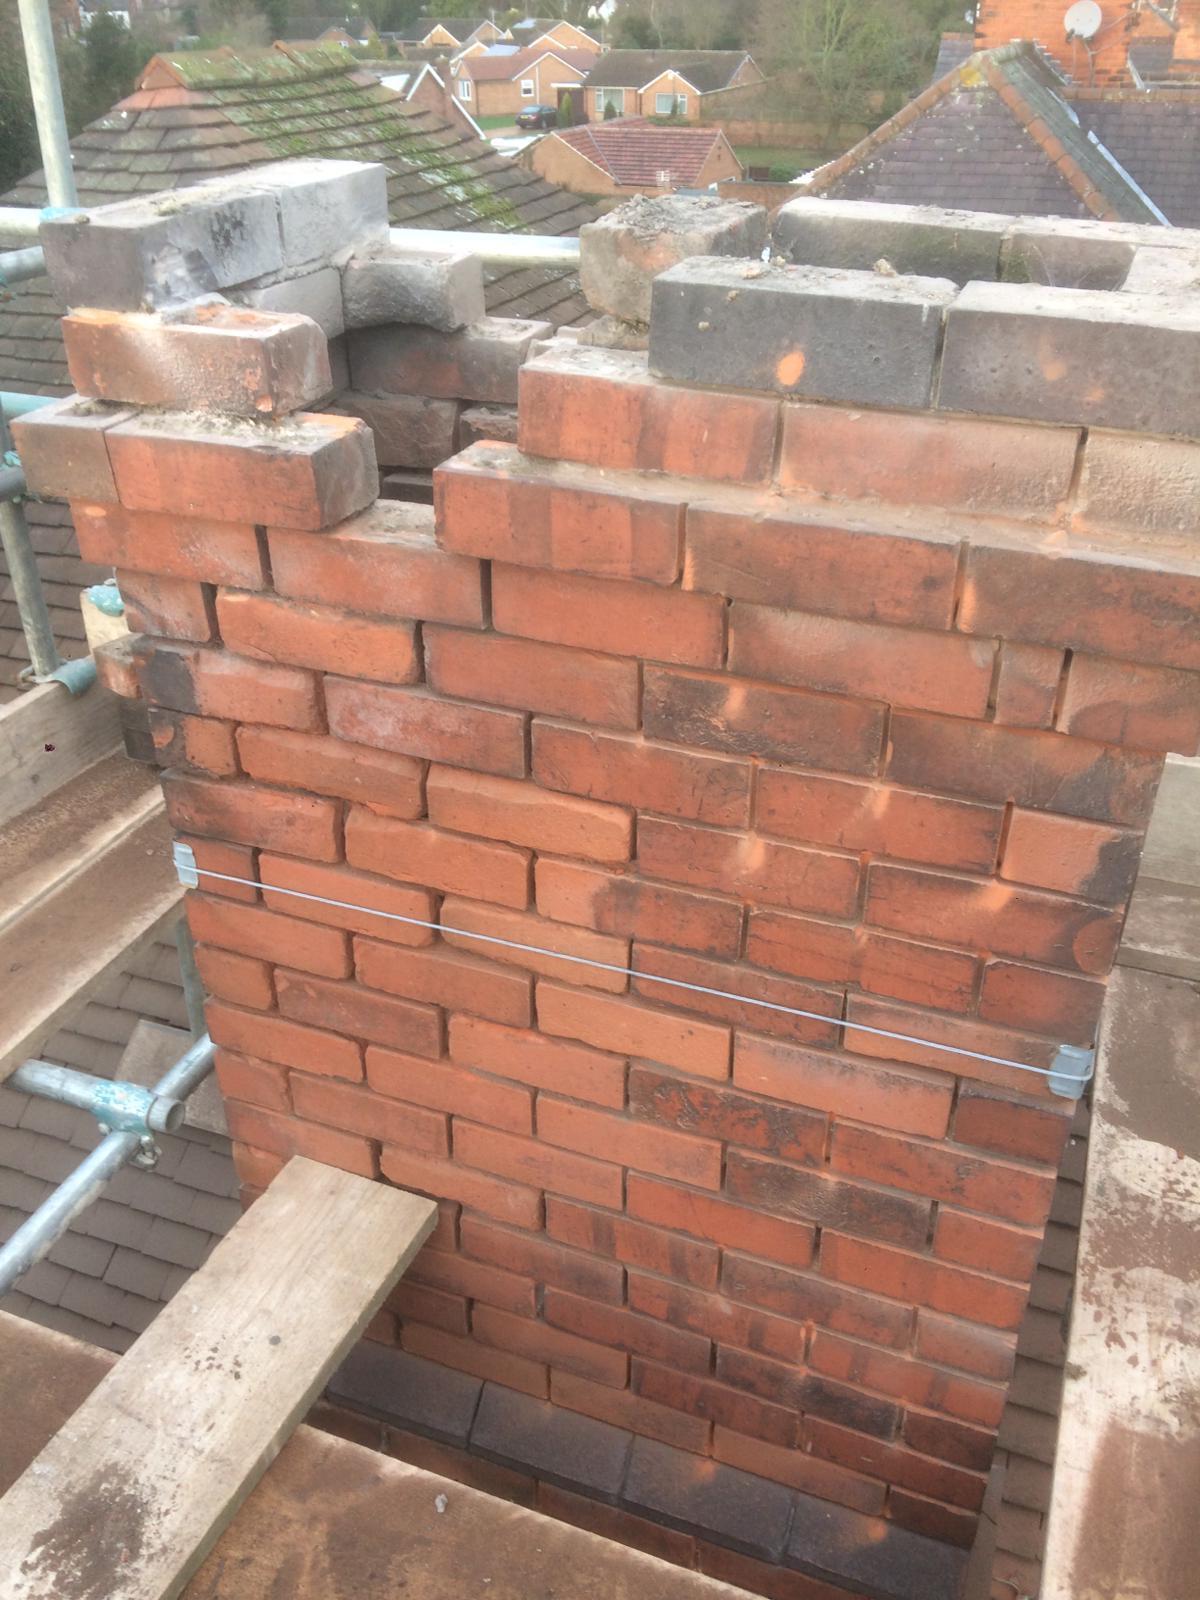 Chimneys & Lead Flashing | Thompsons Roofing